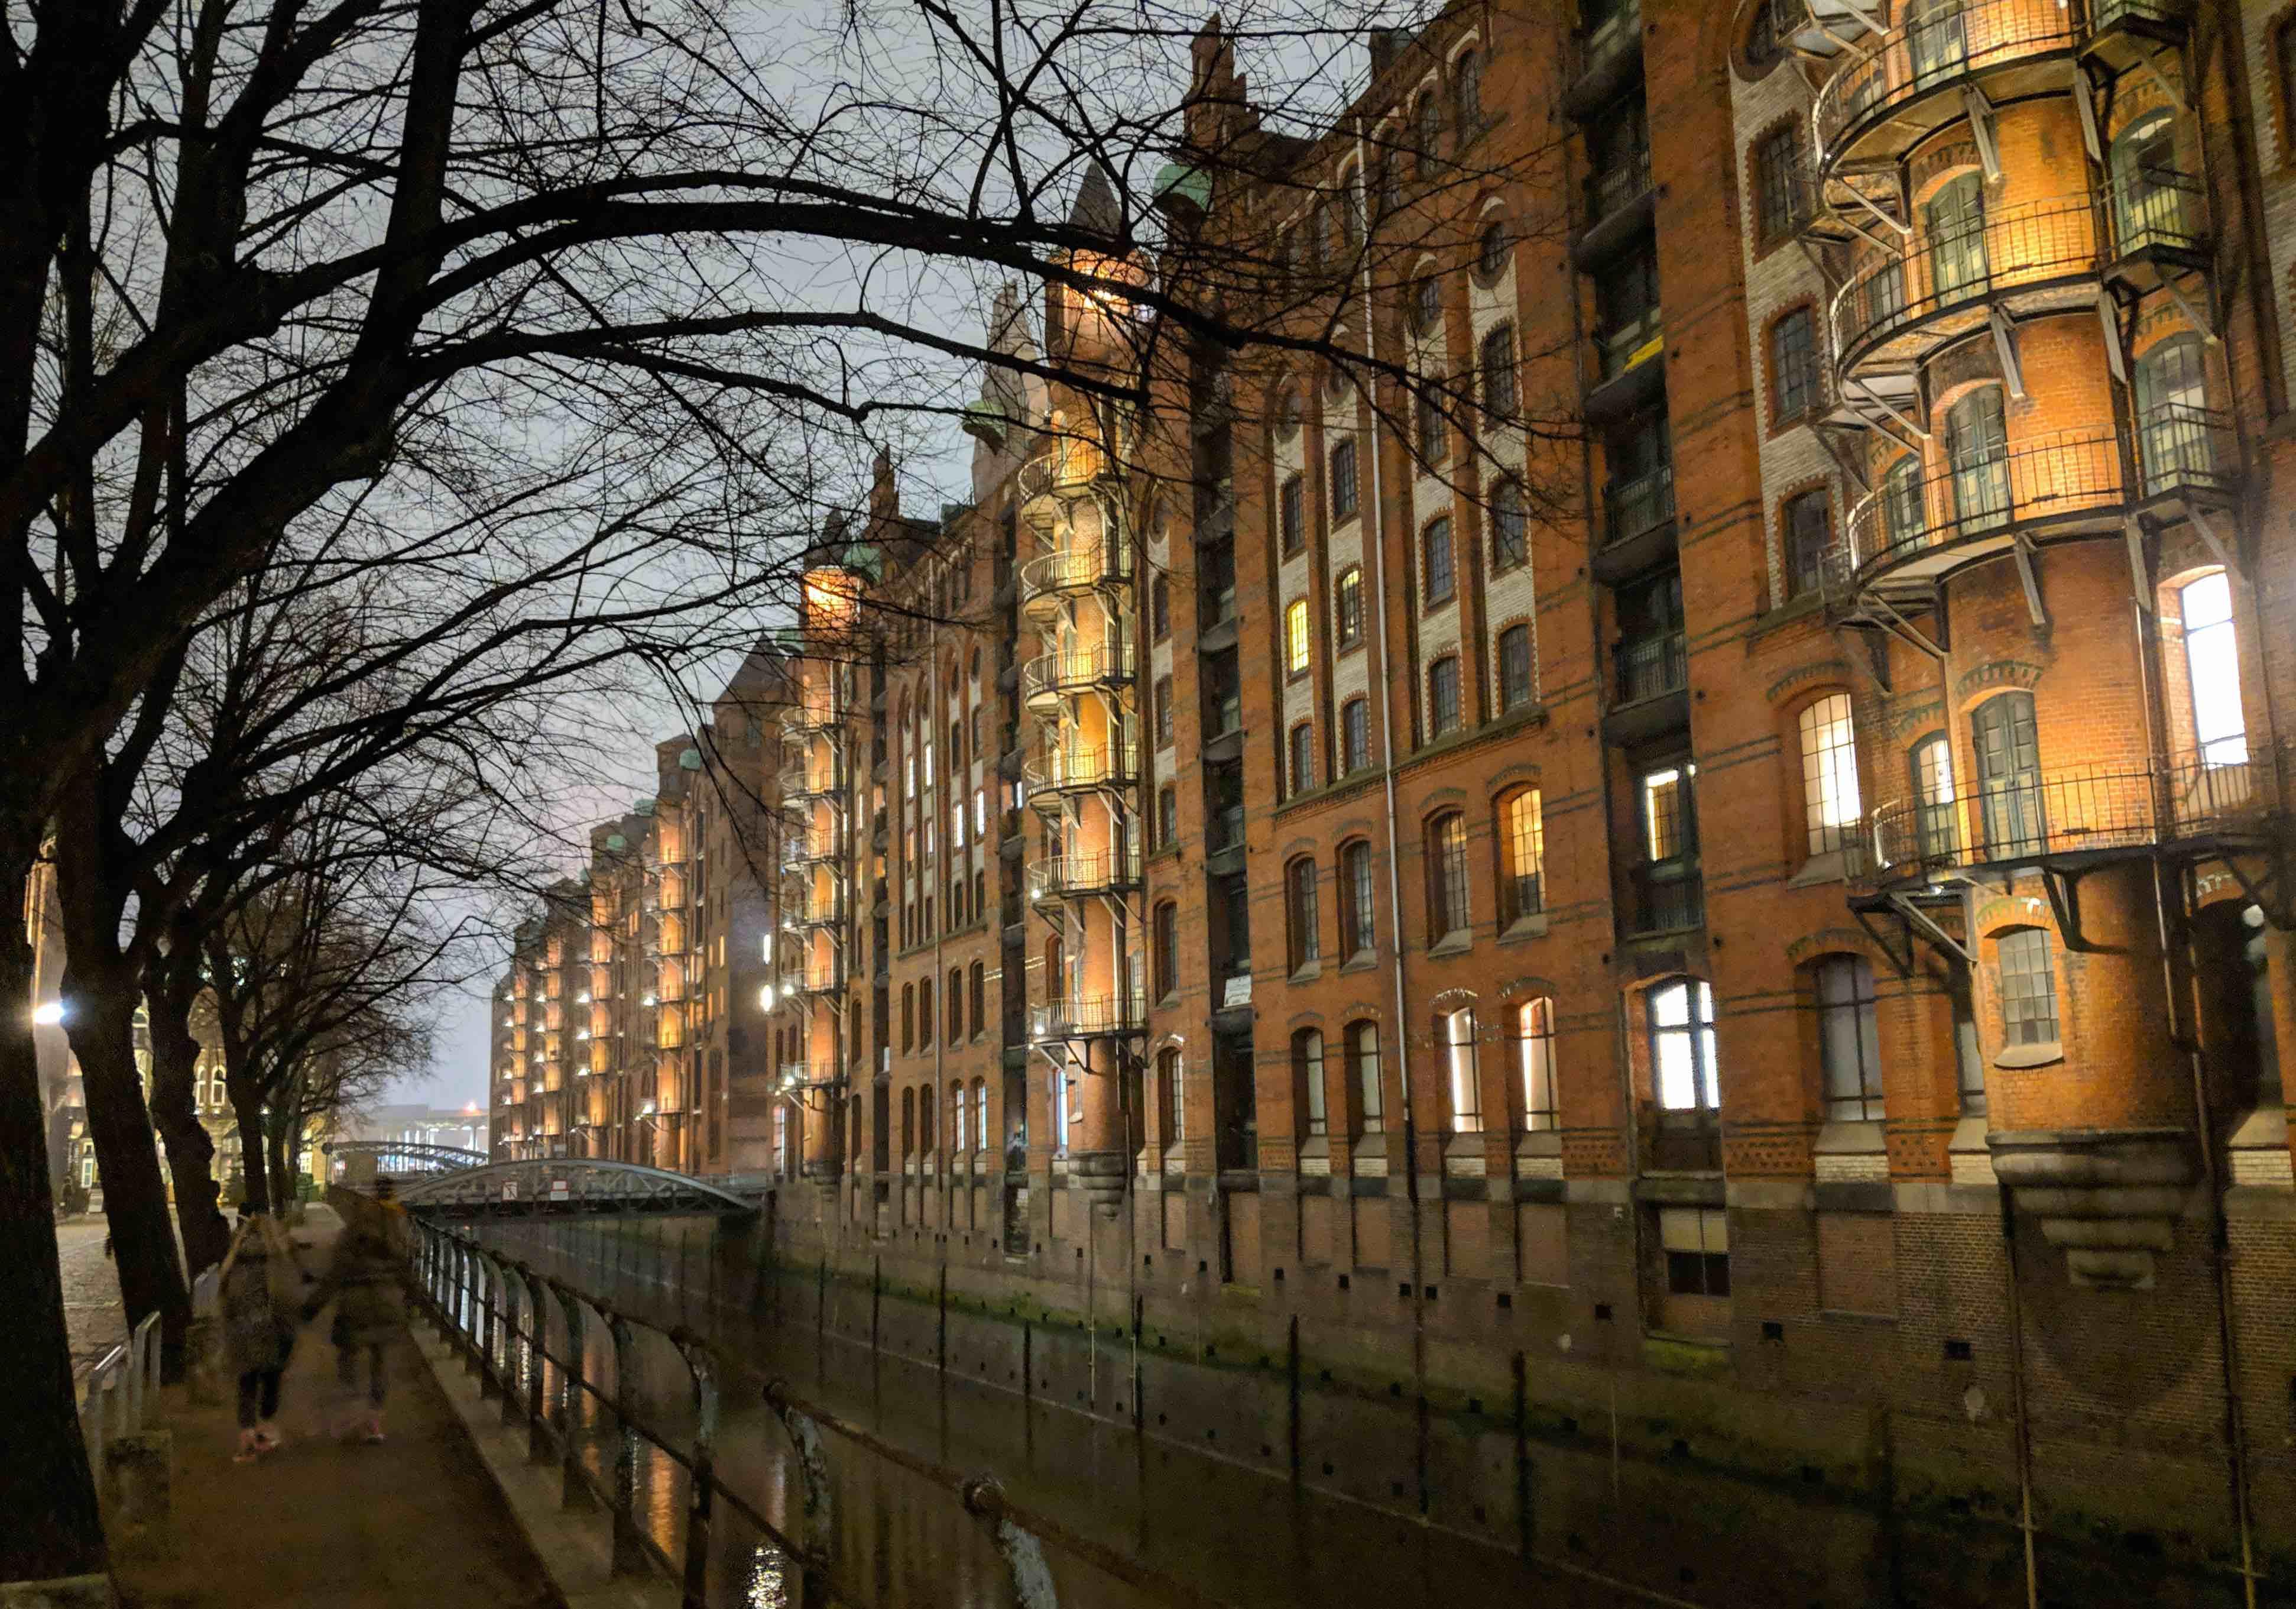 Kontorhausviertel Hamburg